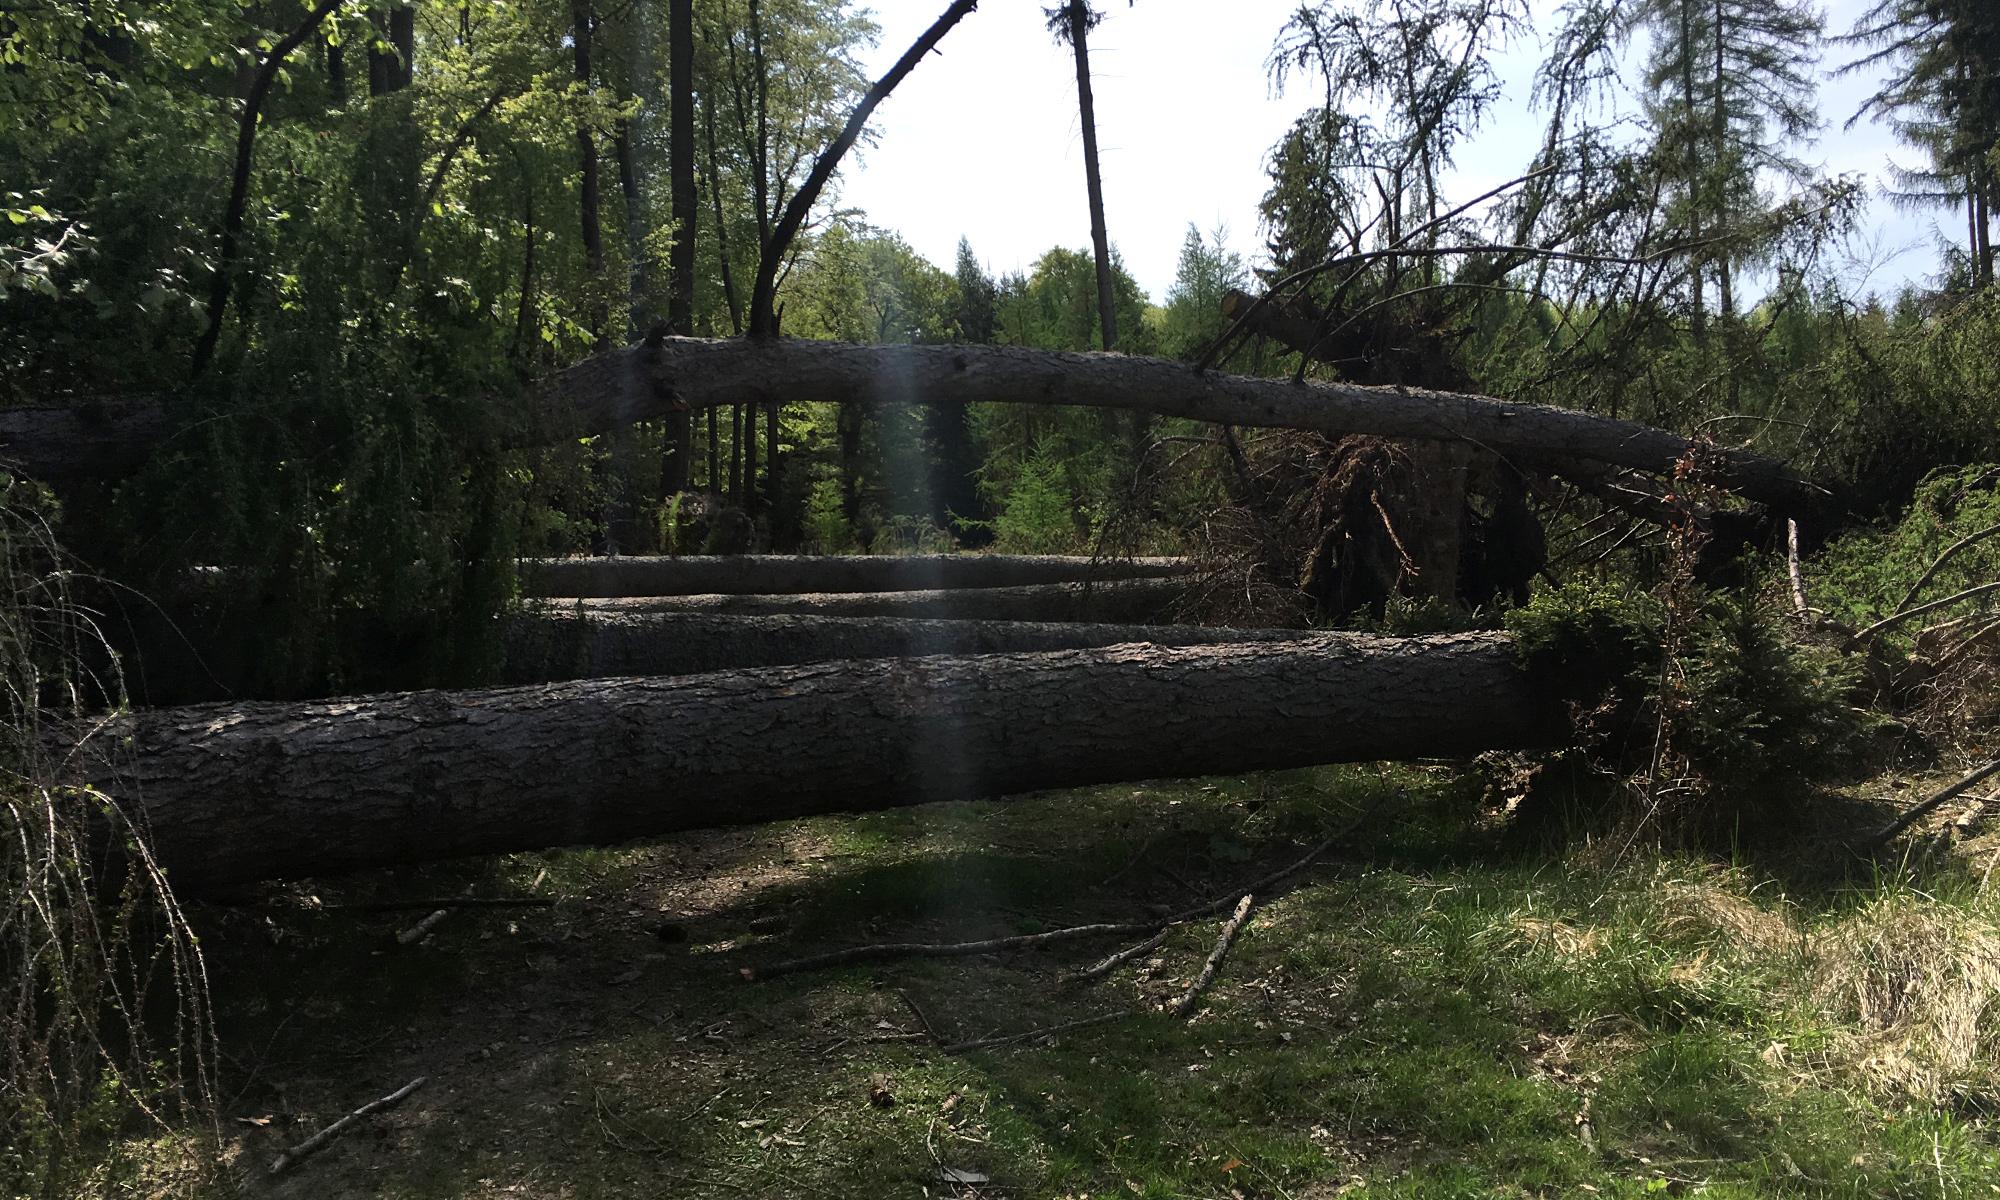 Baumtämme auf dem Weg